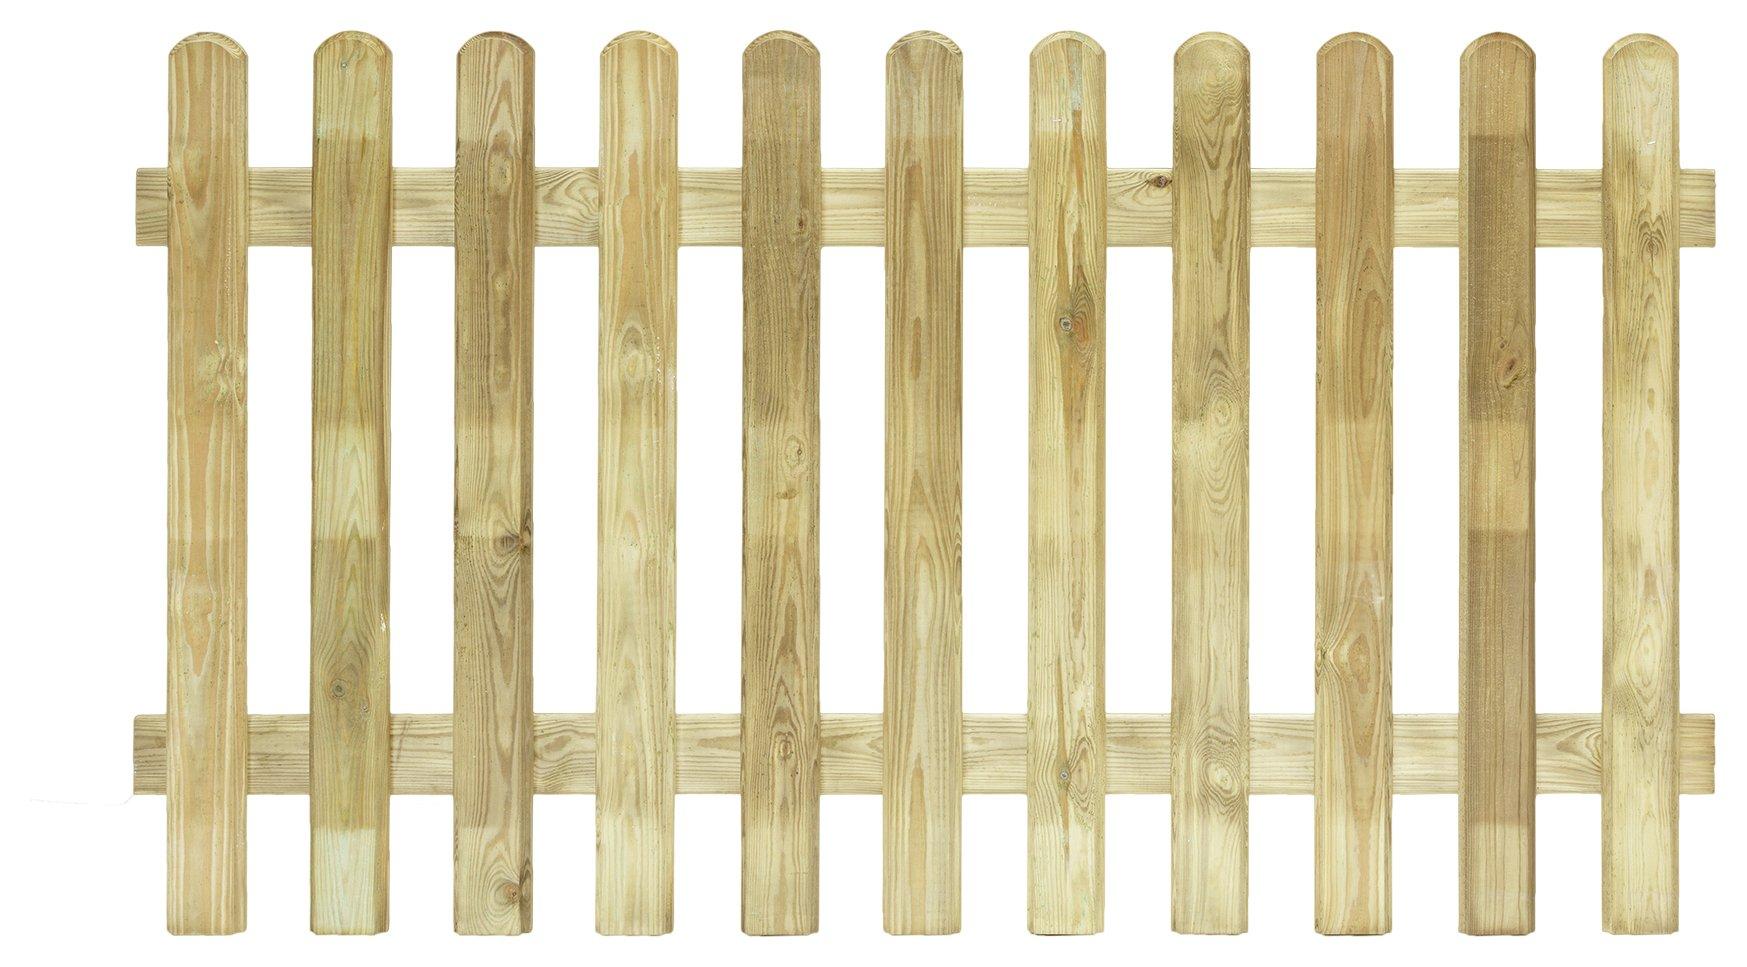 Grange Fencing Elite Profiled Picket Fence Panel - Pack of 4 lowest price